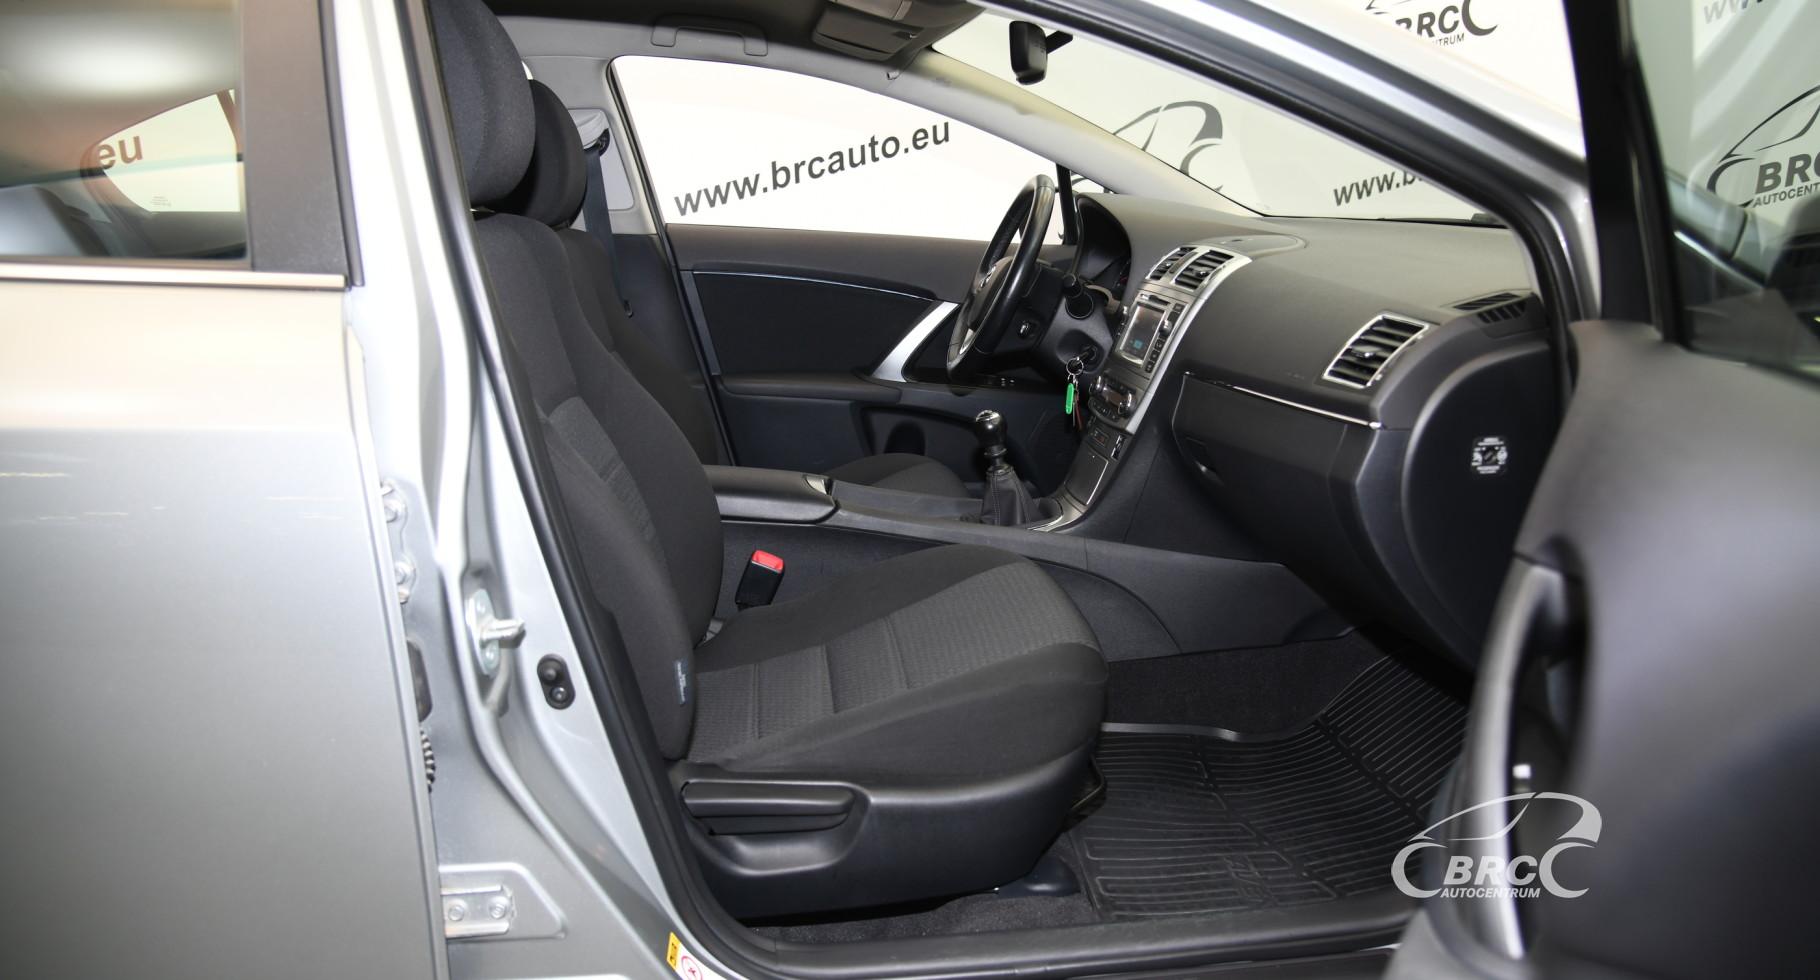 Toyota Avensis 1.8 VVT-i Linea Sol